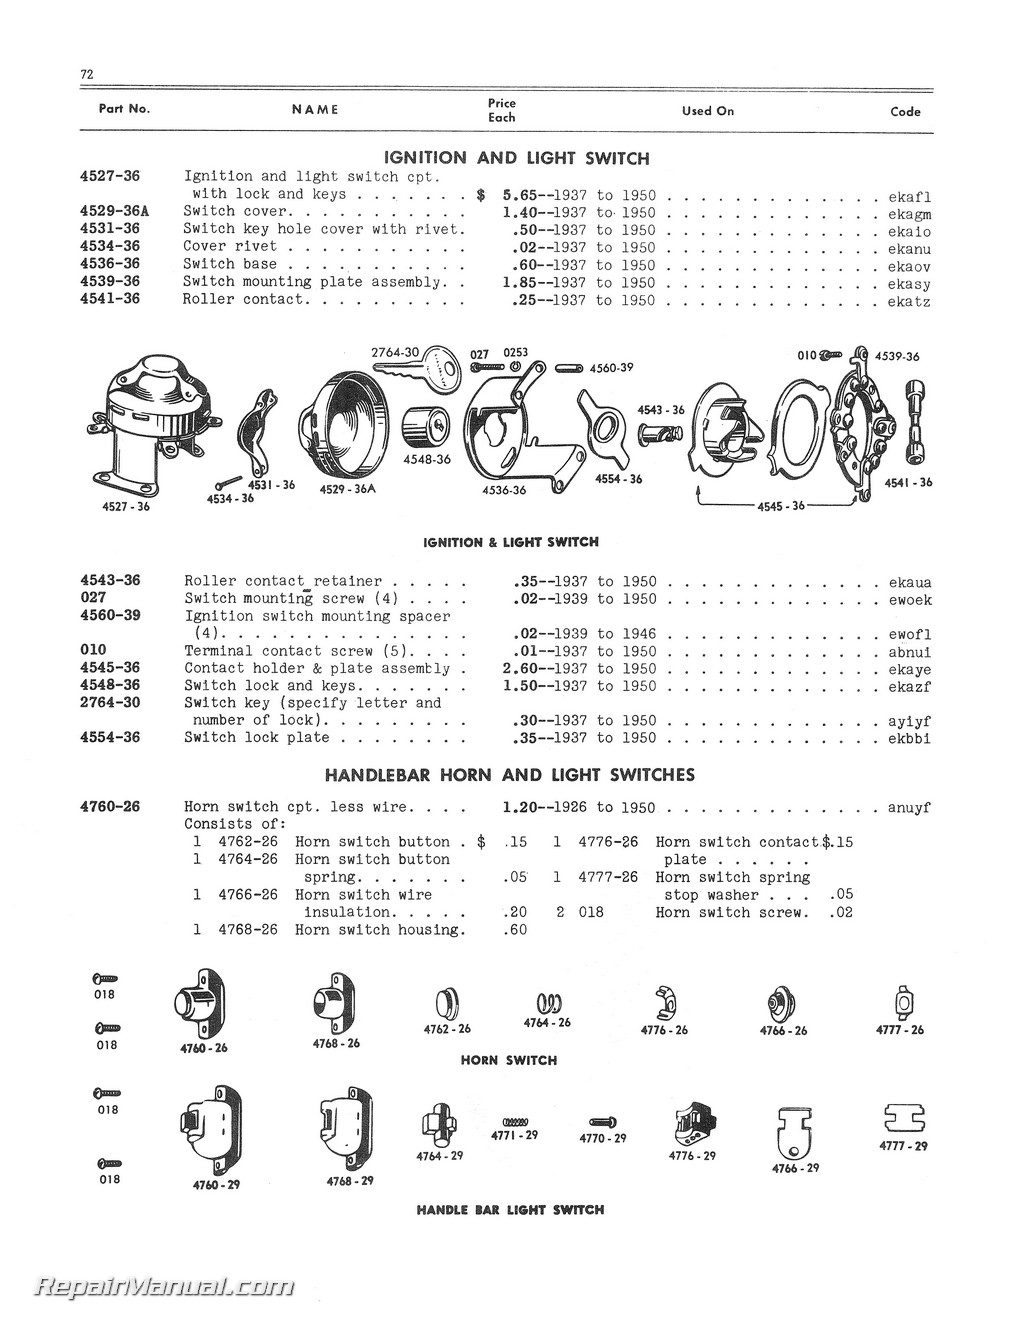 Harley Davidson Servi Car Wiring Diagram Reinvent Your 2001 Road Glide Electrical 1997 Schematics Rh Enr Green Com 2004 2007 And Diagrams